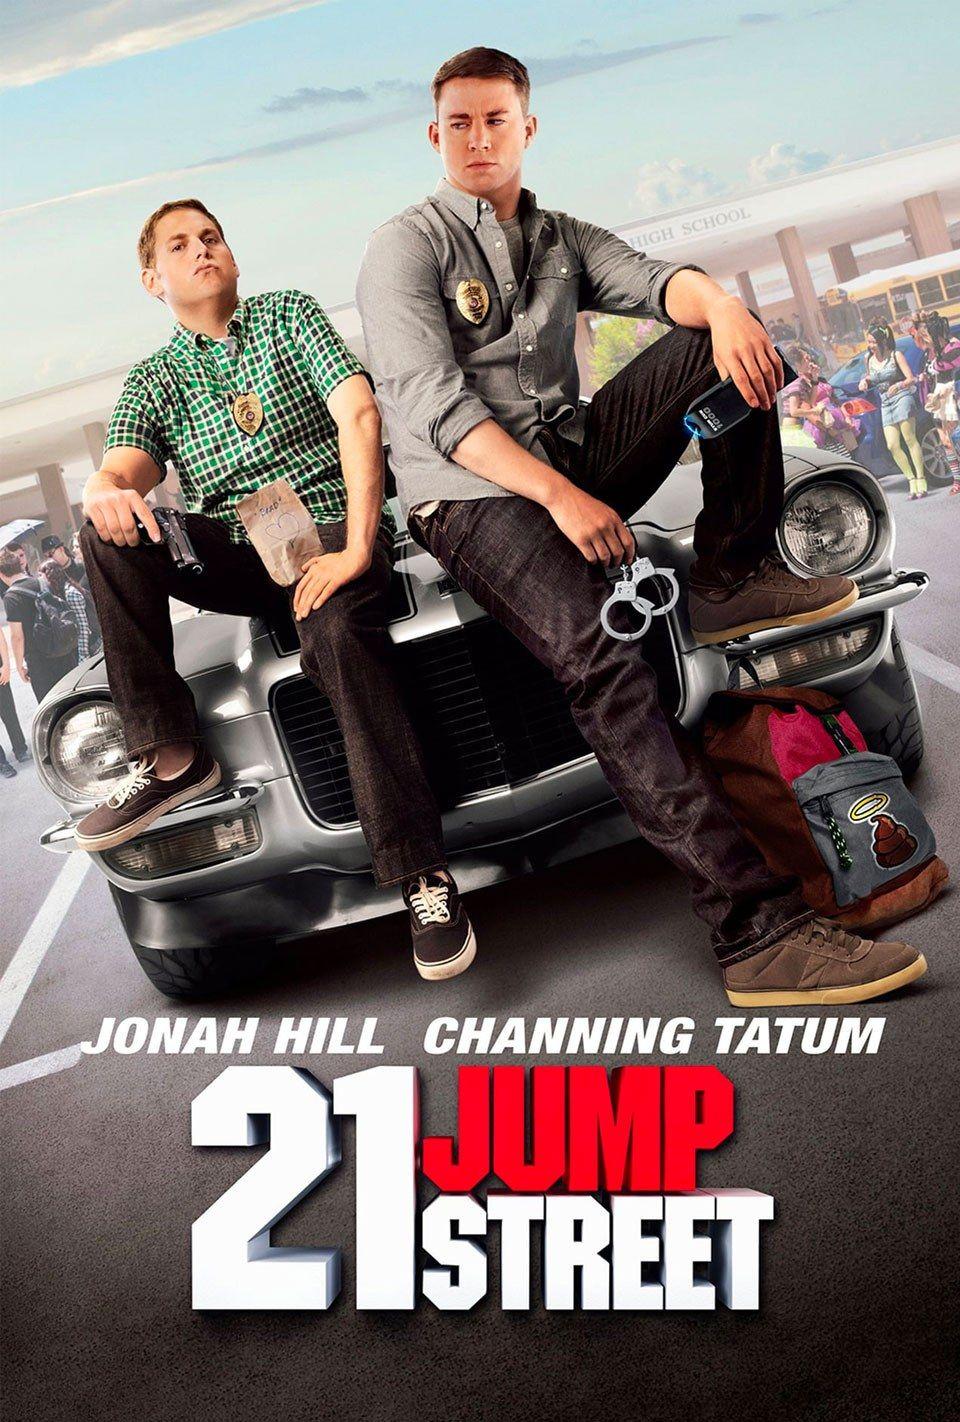 21 Jump Street Streaming : street, streaming, Street, (2012), Script, Written, Michael, Bacall., Street,, Movies, Online, Free,